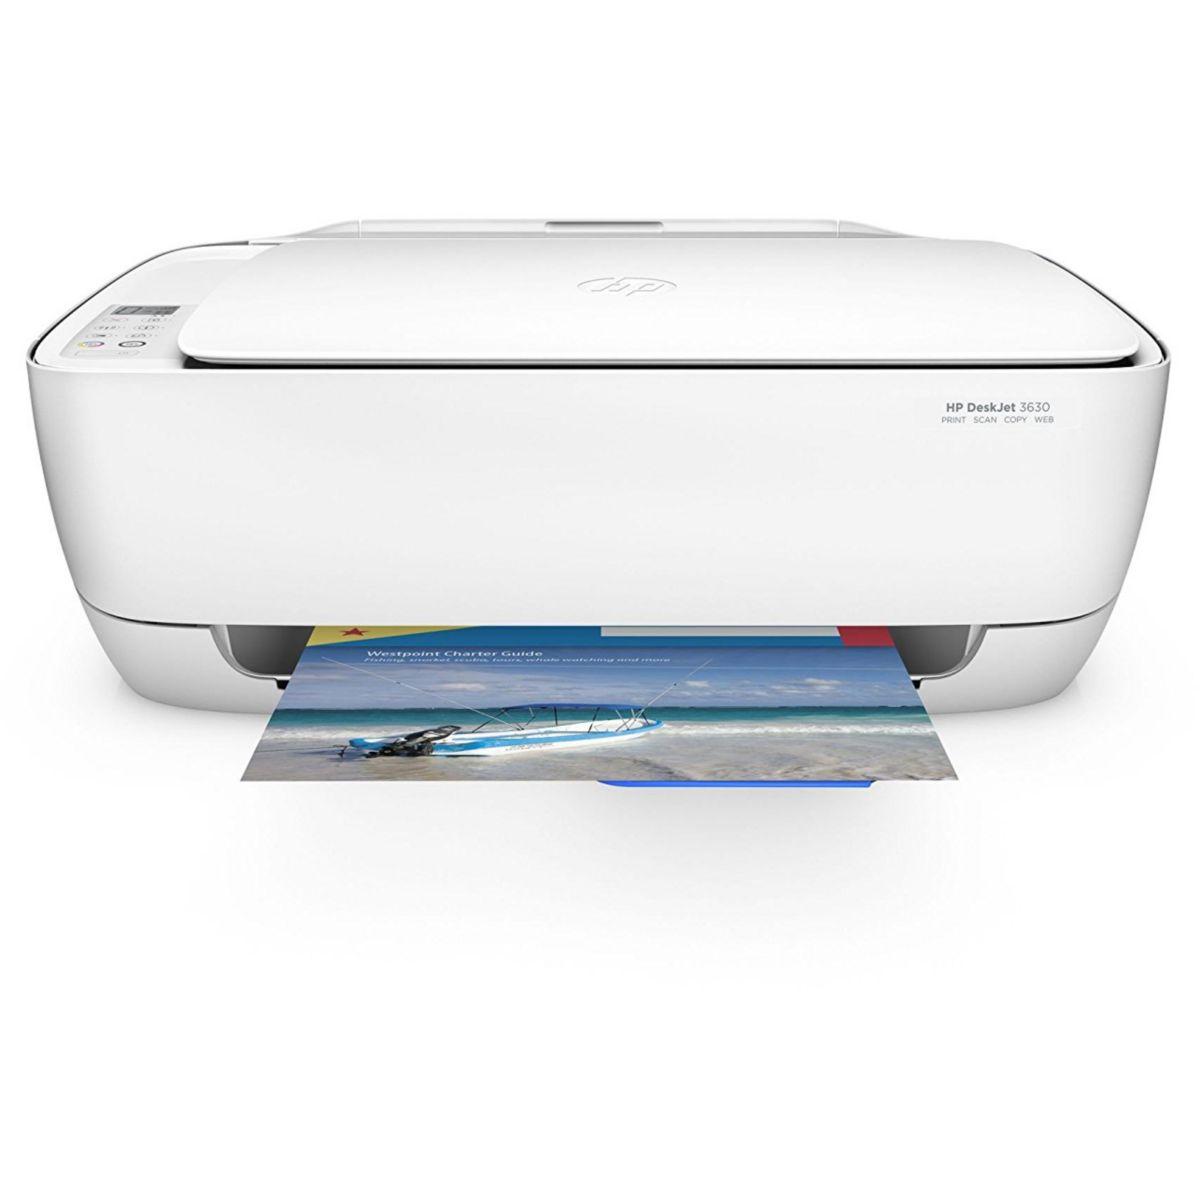 Imprimante jet d'encre HP Deskjet 3639 (photo)